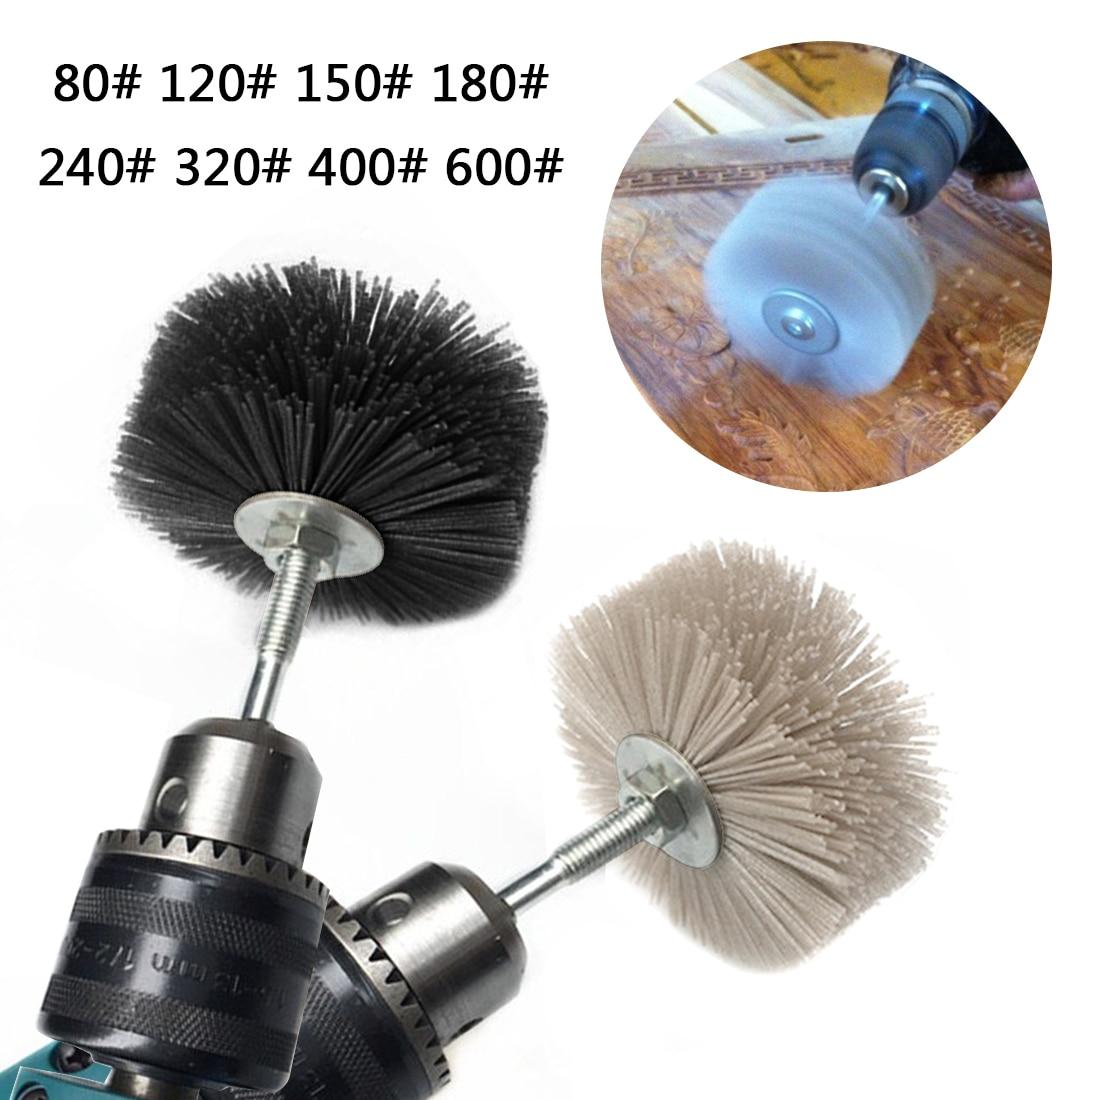 1pcs 80mm Drill Abrasive Wire Grinding Wheel Nylon Bristle Polishing Brush For Wood Furniture Mahogany Finish